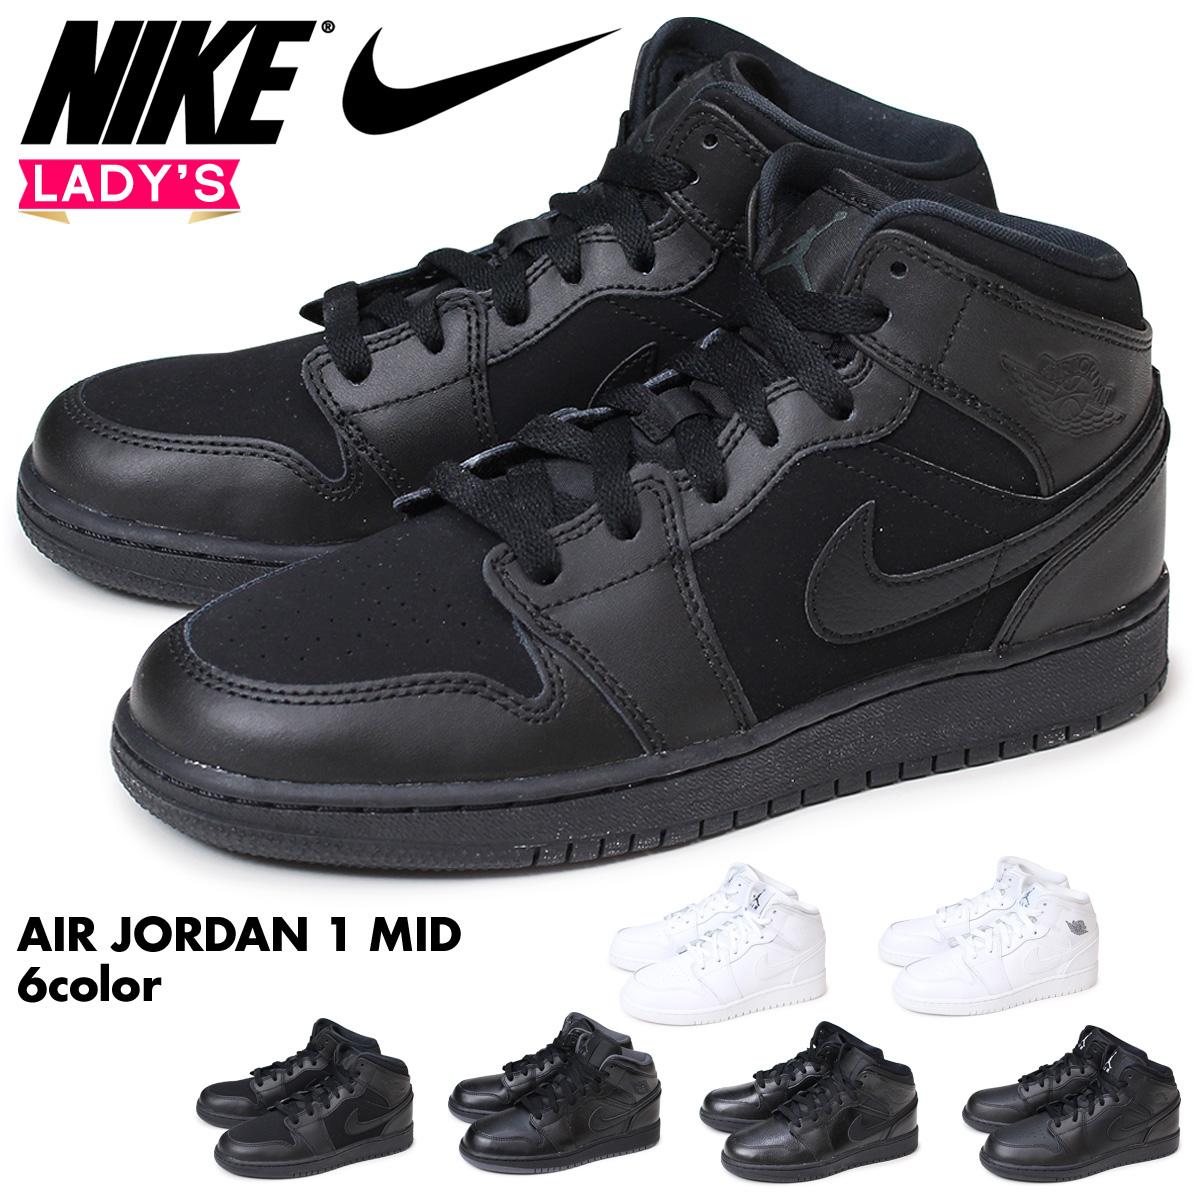 innovative design 31b02 c8215 NIKE Nike Air Jordan sneakers Lady's AIR JORDAN 1 MID GS Air Jordan 1 mid  shoes black white white